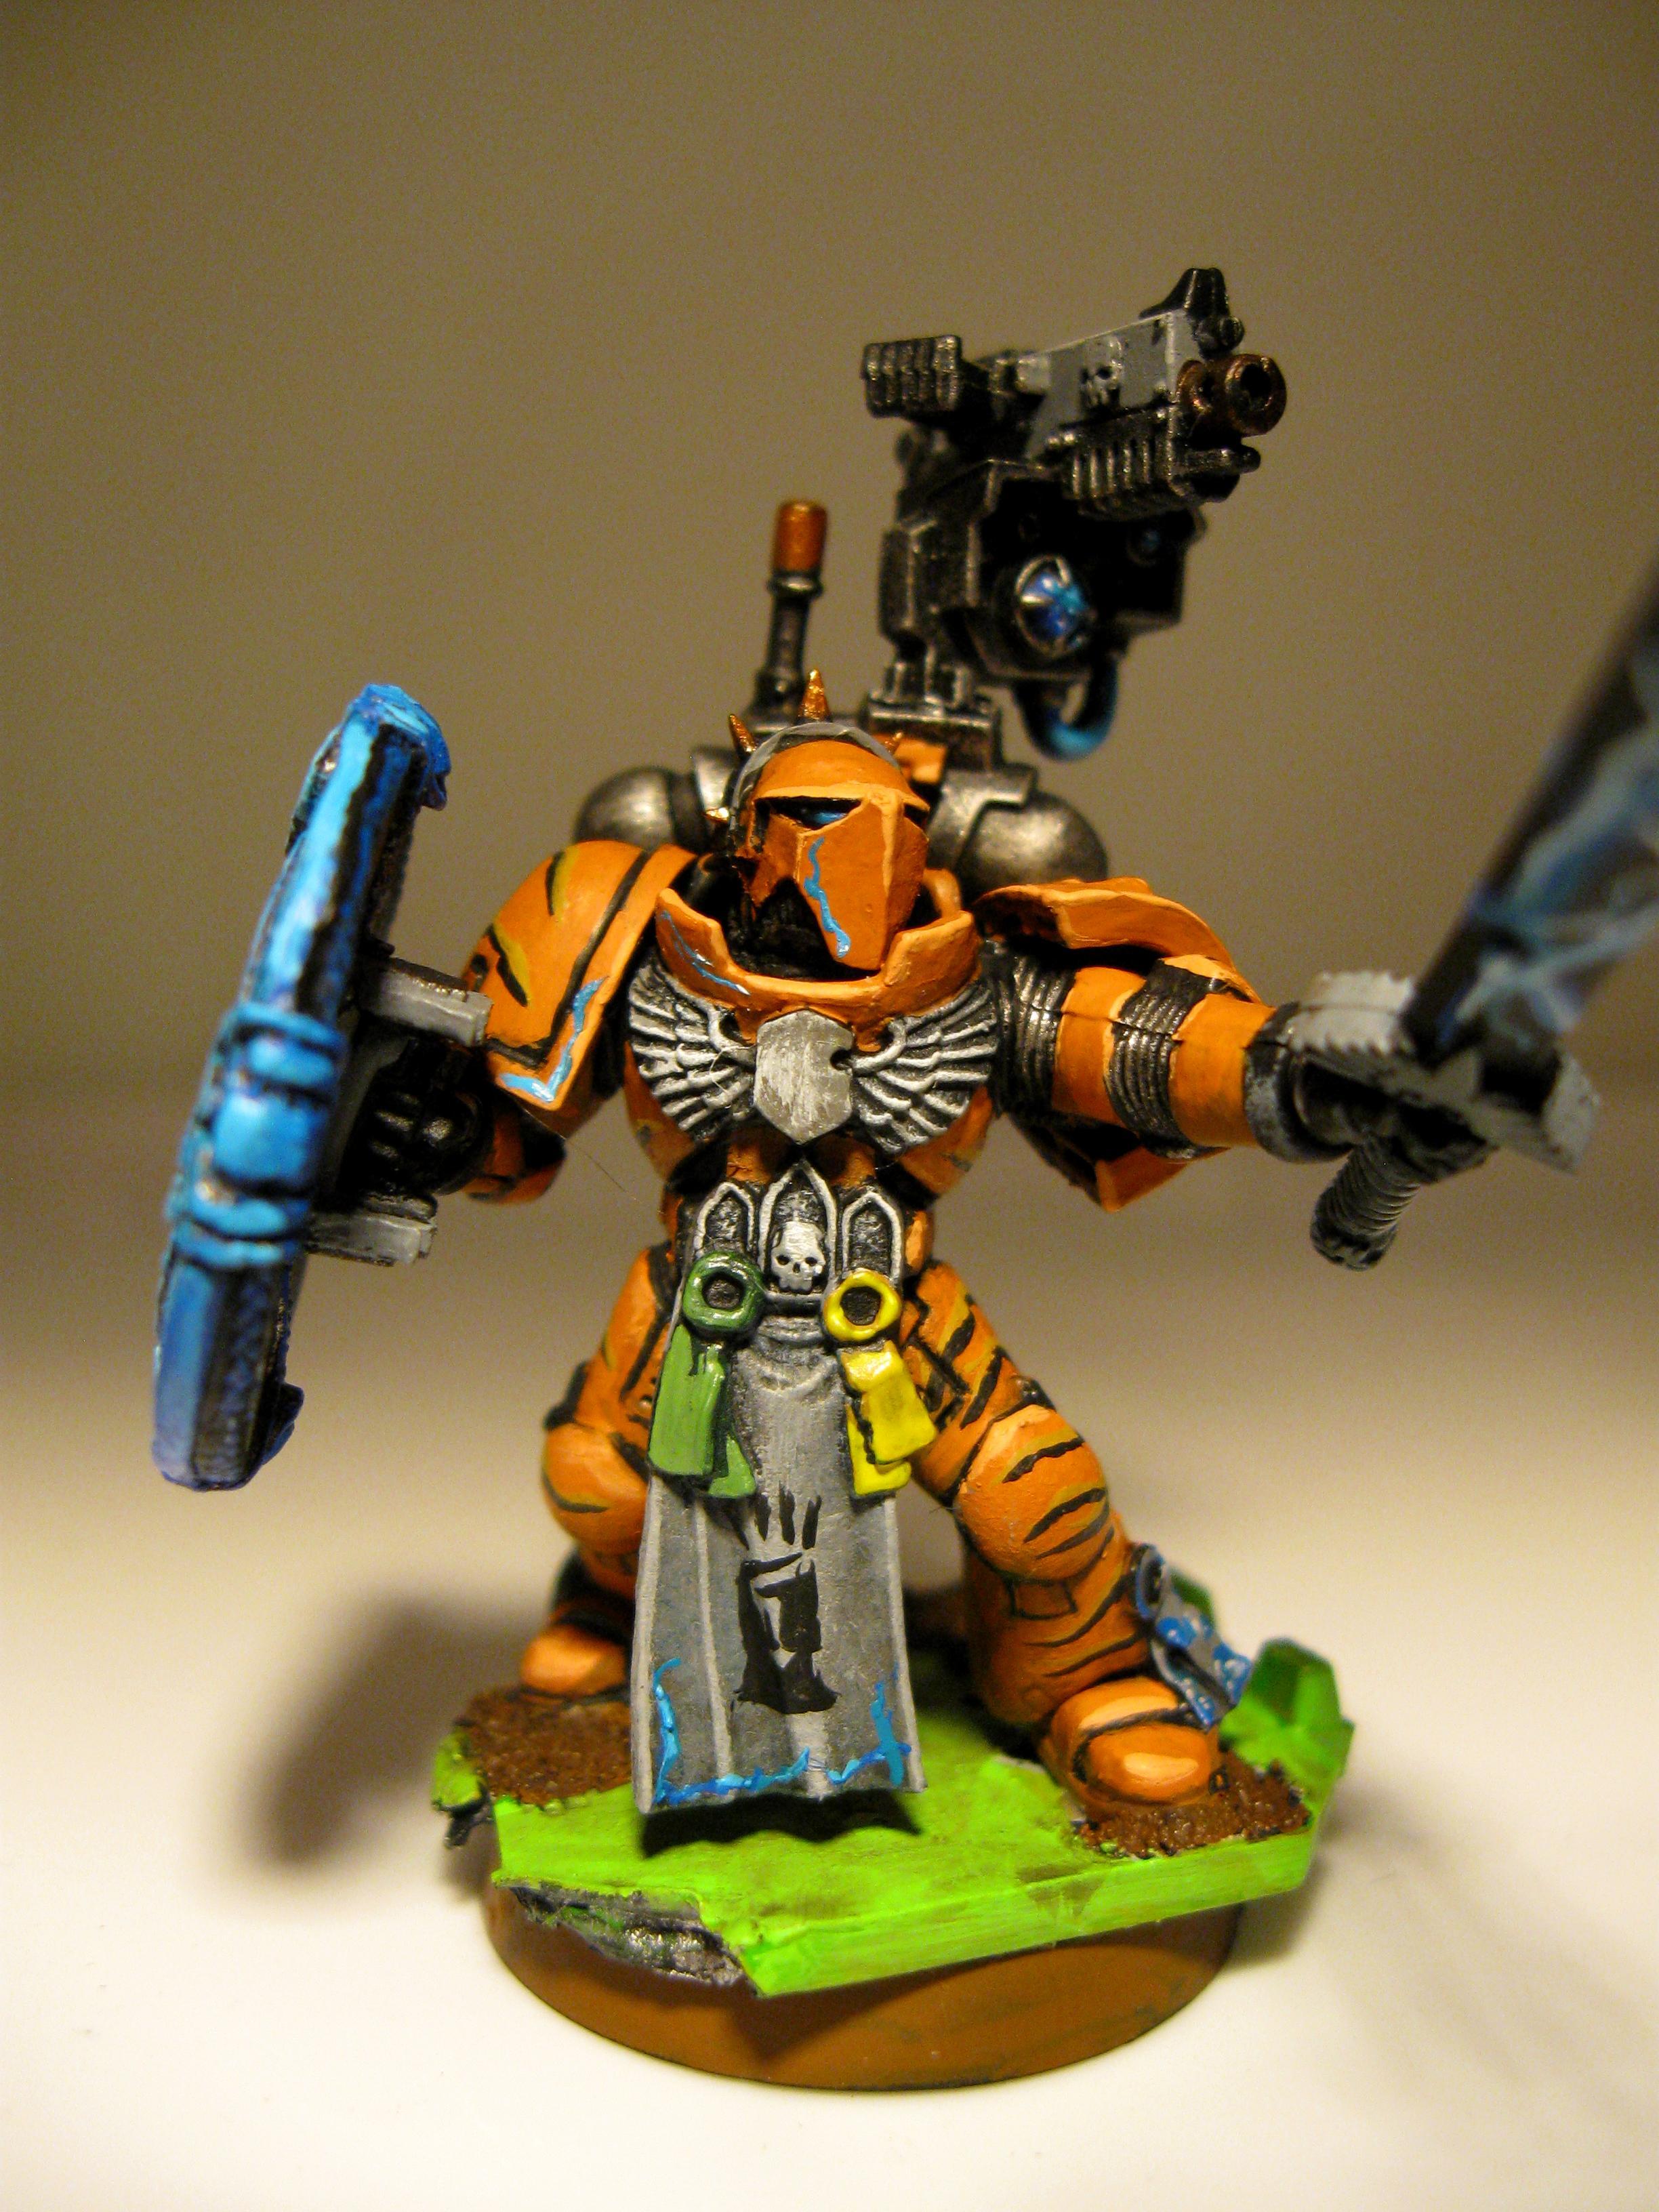 Astral Claws, Badab War, Corien Sumatris, Space Marines, Tiger Claws, Warhammer 40,000